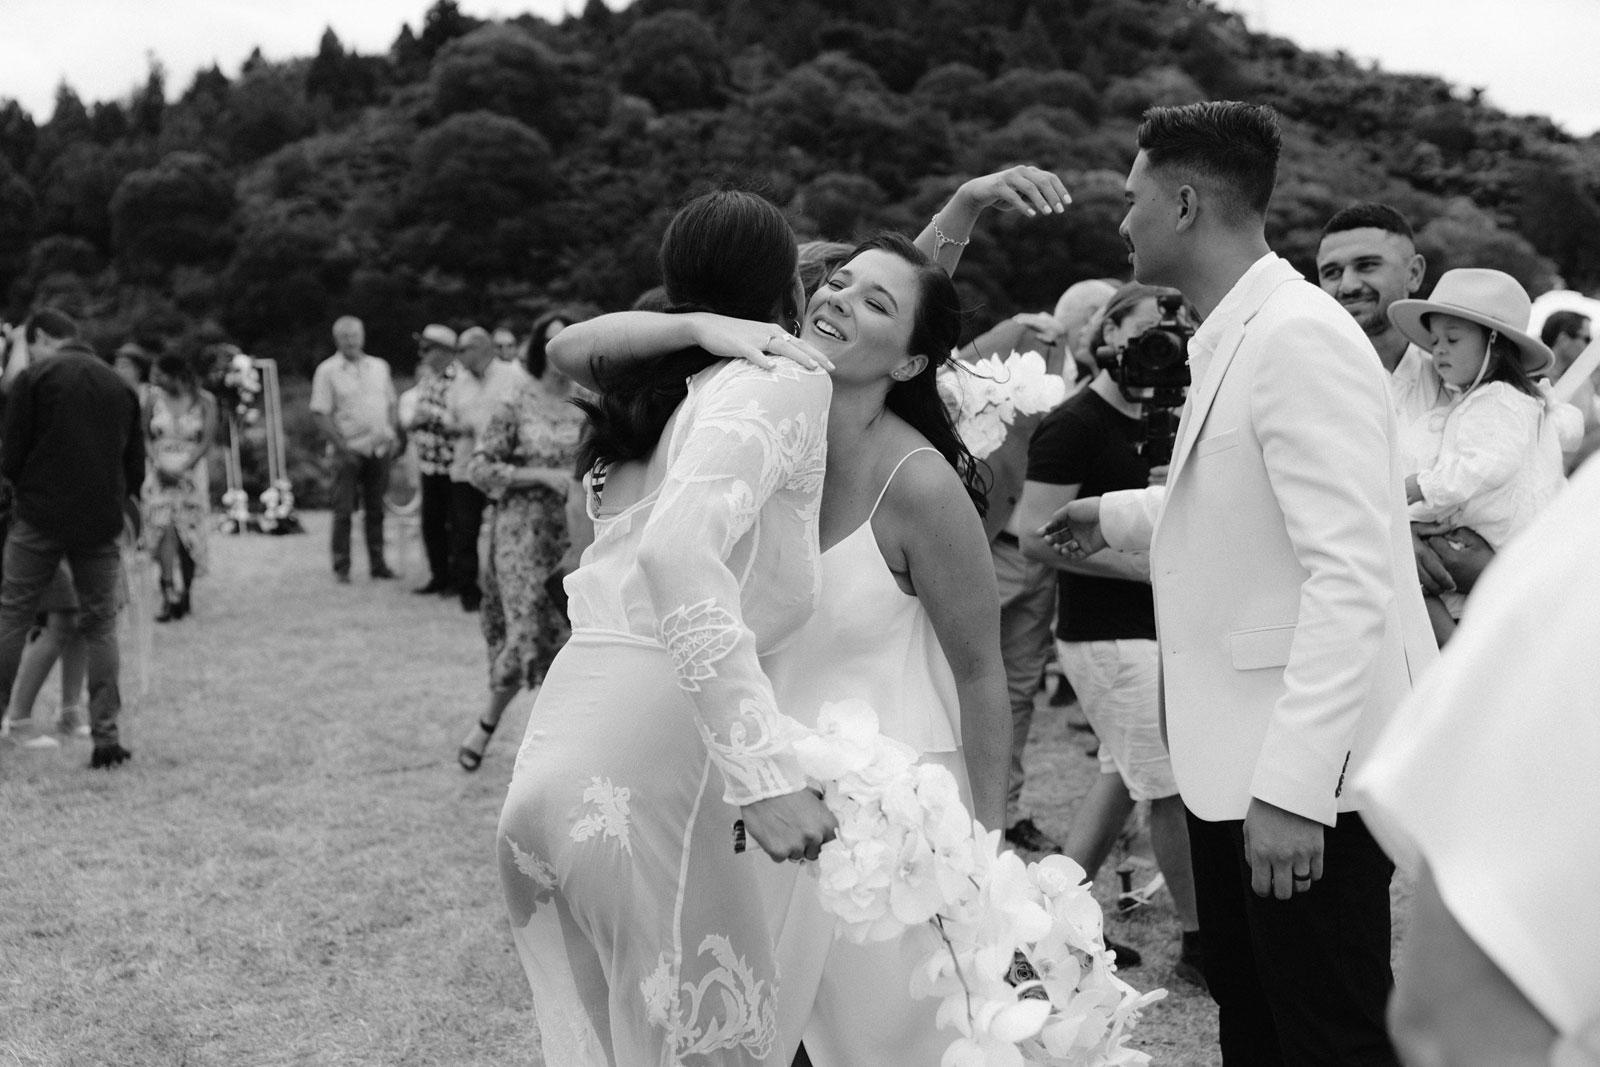 newfound-s-t-hunua-auckland-wedding-photographers-046